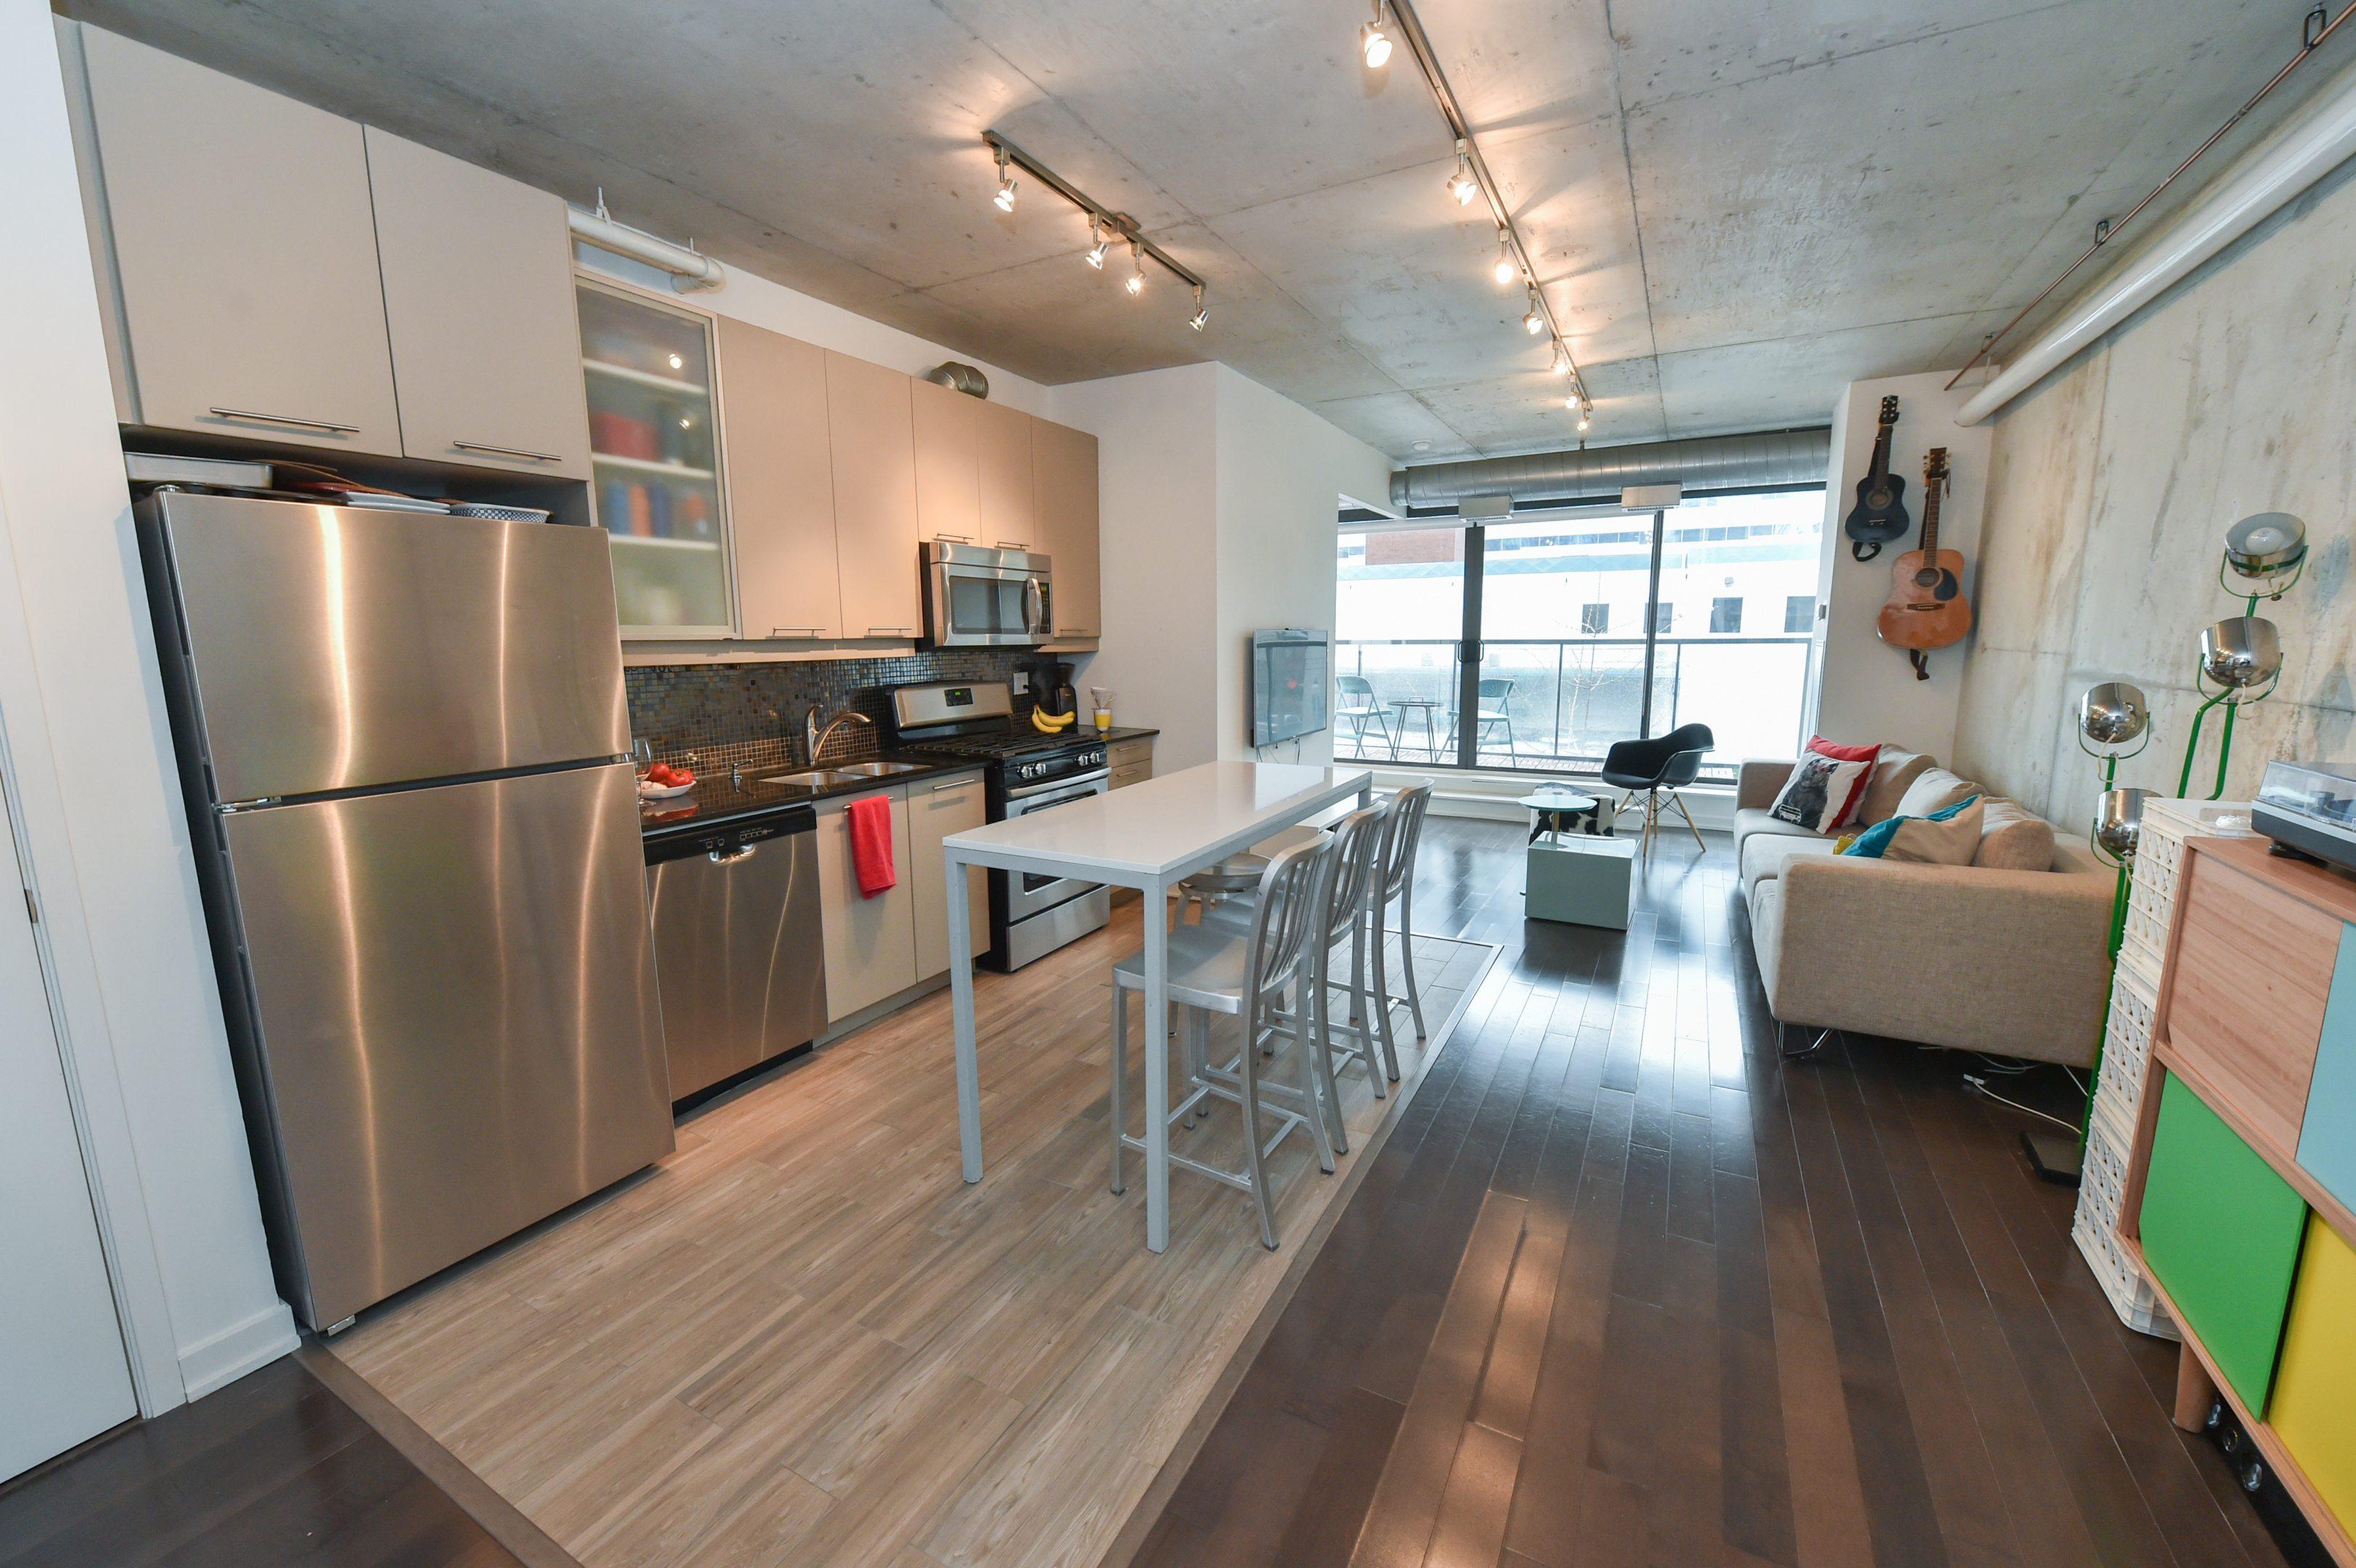 toronto-apartment-for-rent-533-richmond-street-west-2